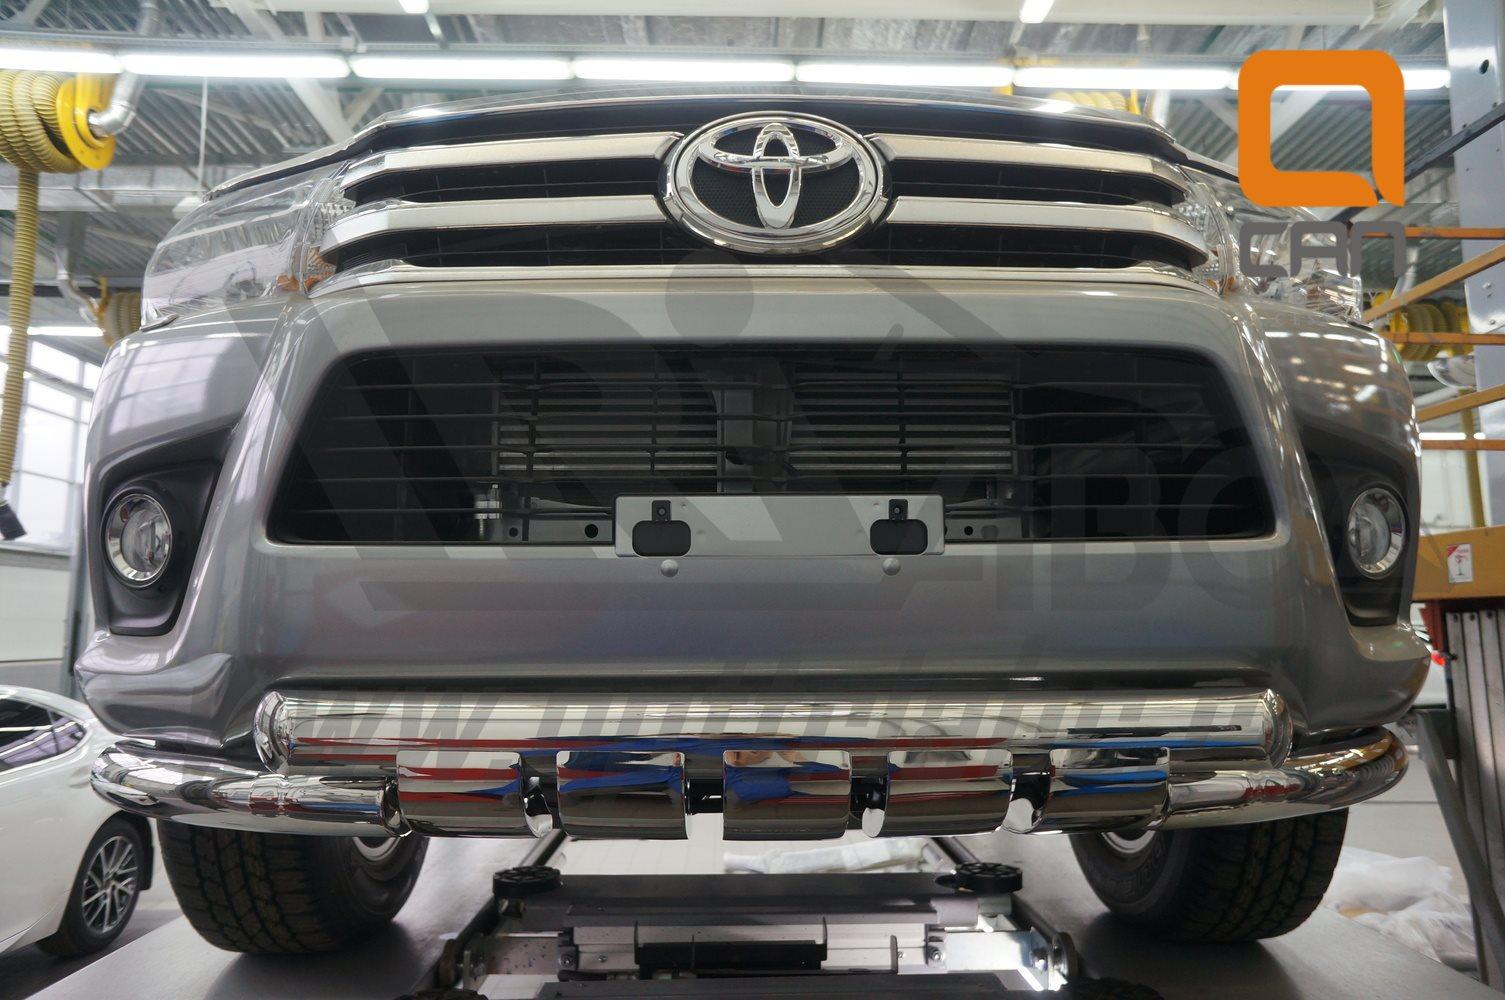 Защита переднего бампера Toyota Hilux (2015-) (двойная Shark) d76 76 3